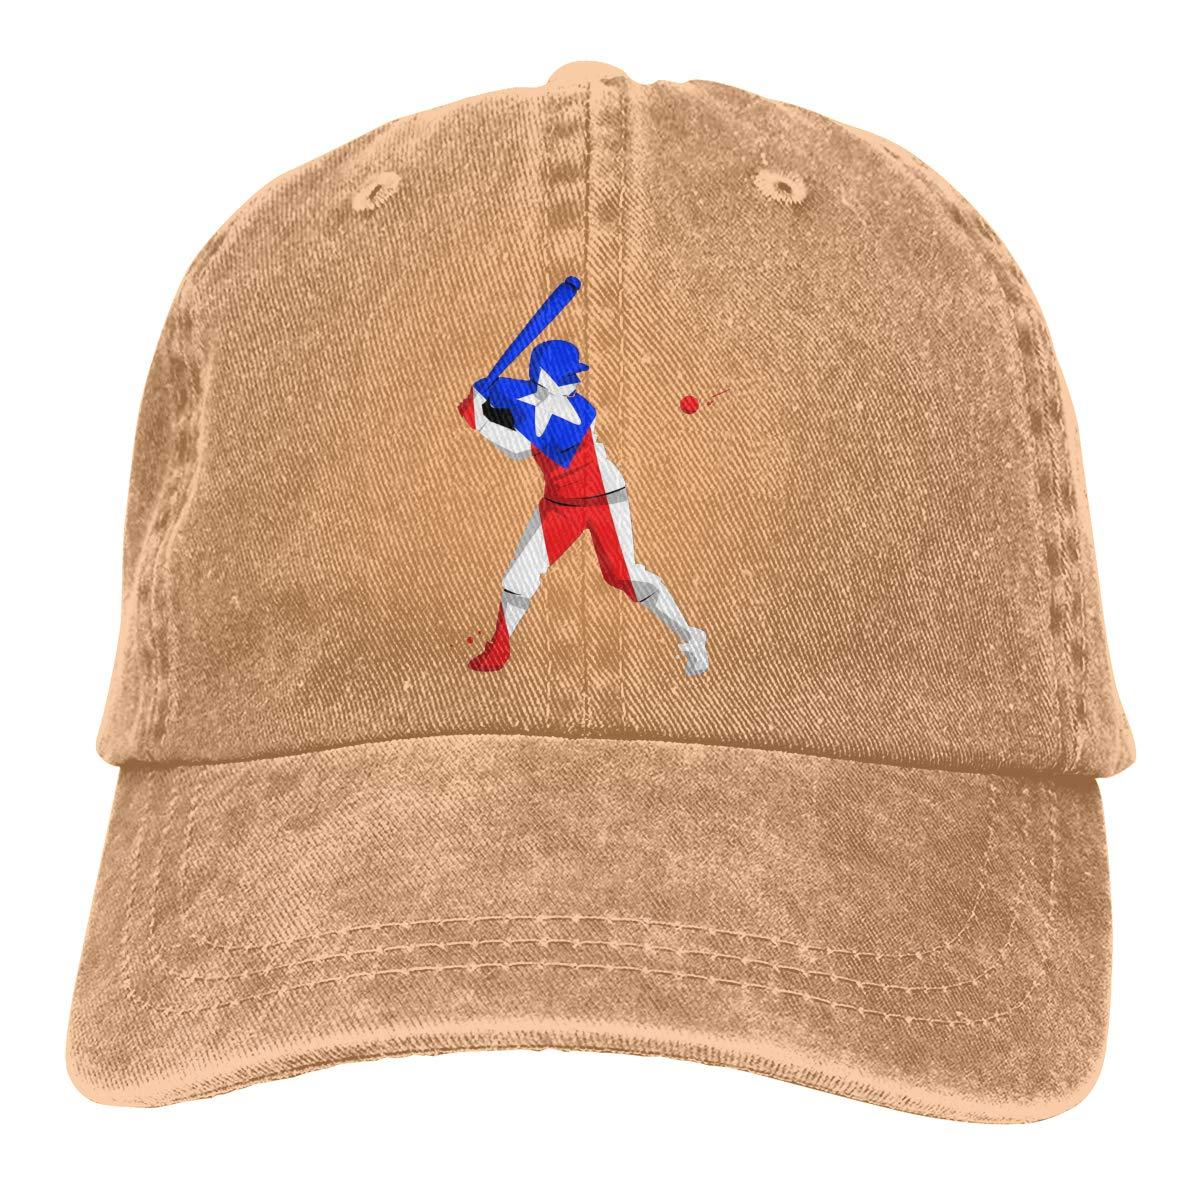 DeniCar Unisex Adjustable Baseball Caps Cody-Bellinger-Vector-Pattern Cowboy Skull Cap